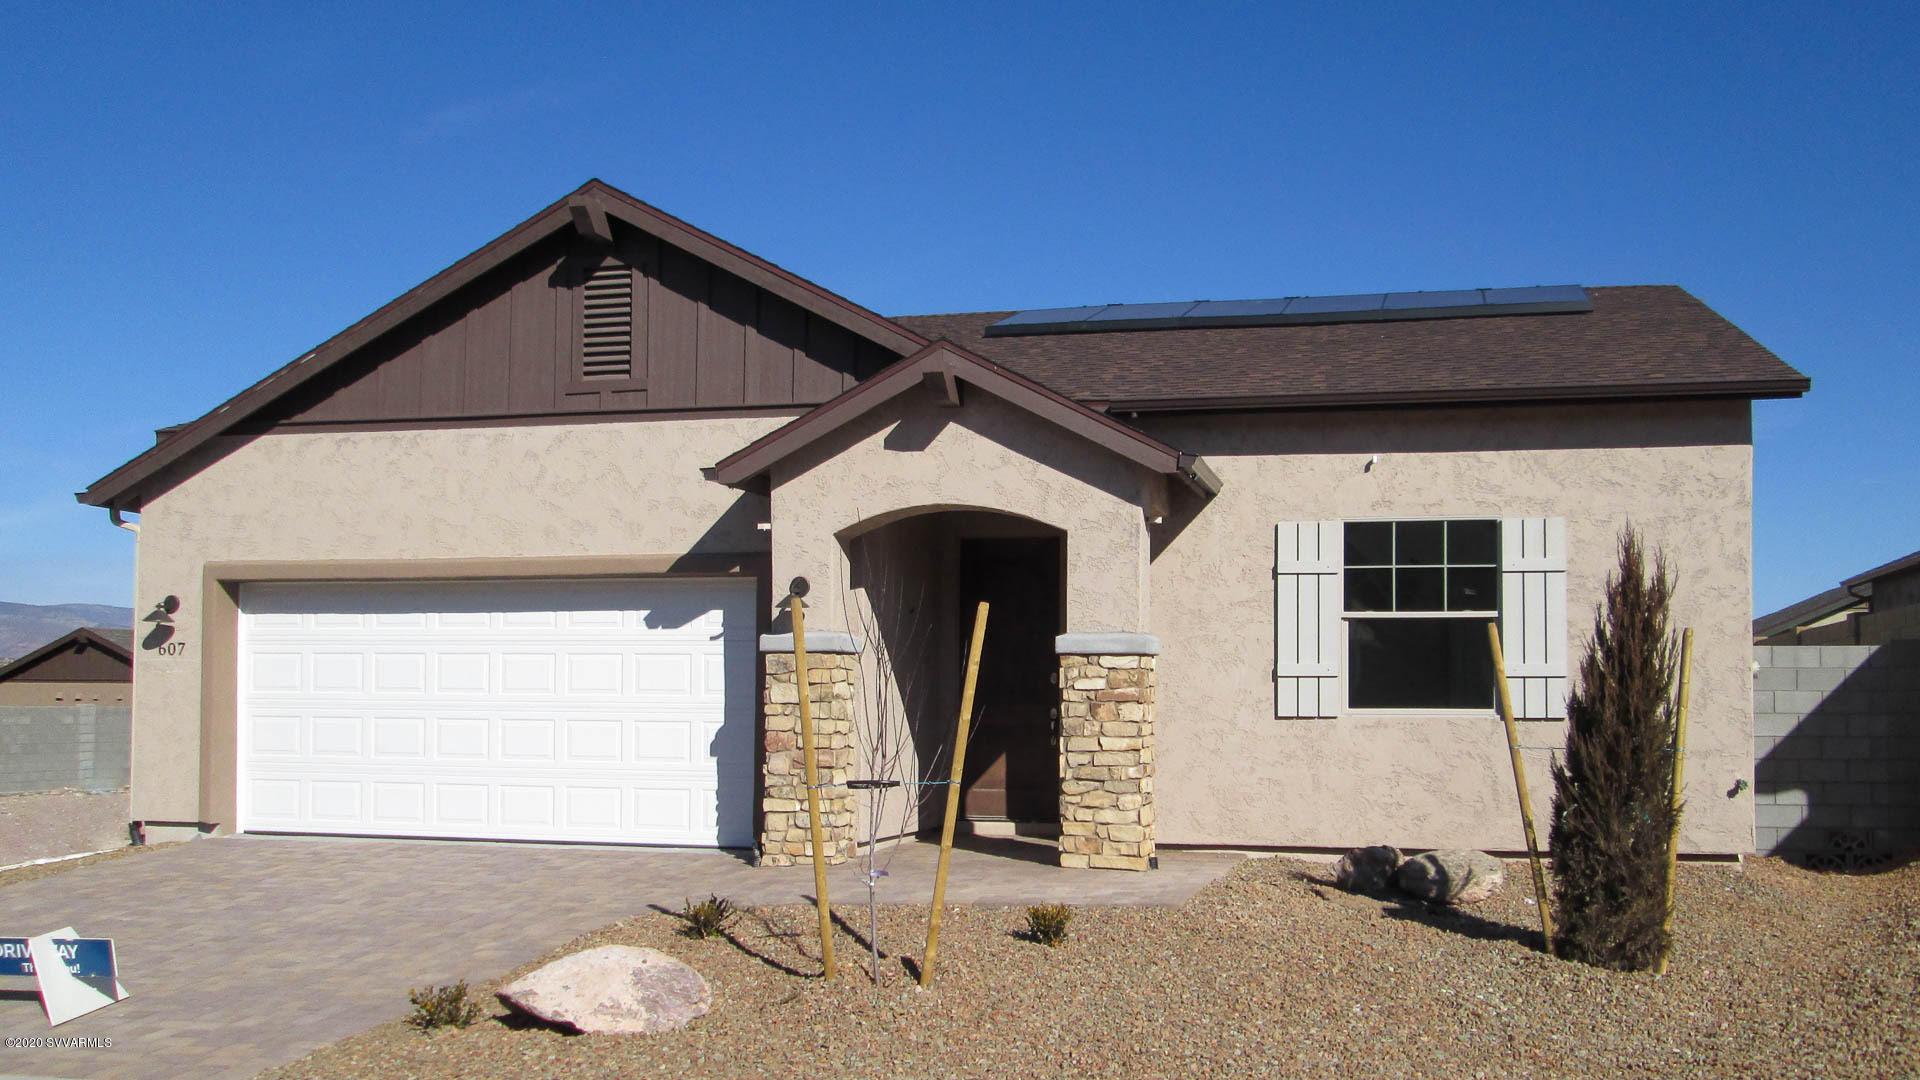 607 Tapco Lane Clarkdale, AZ 86324